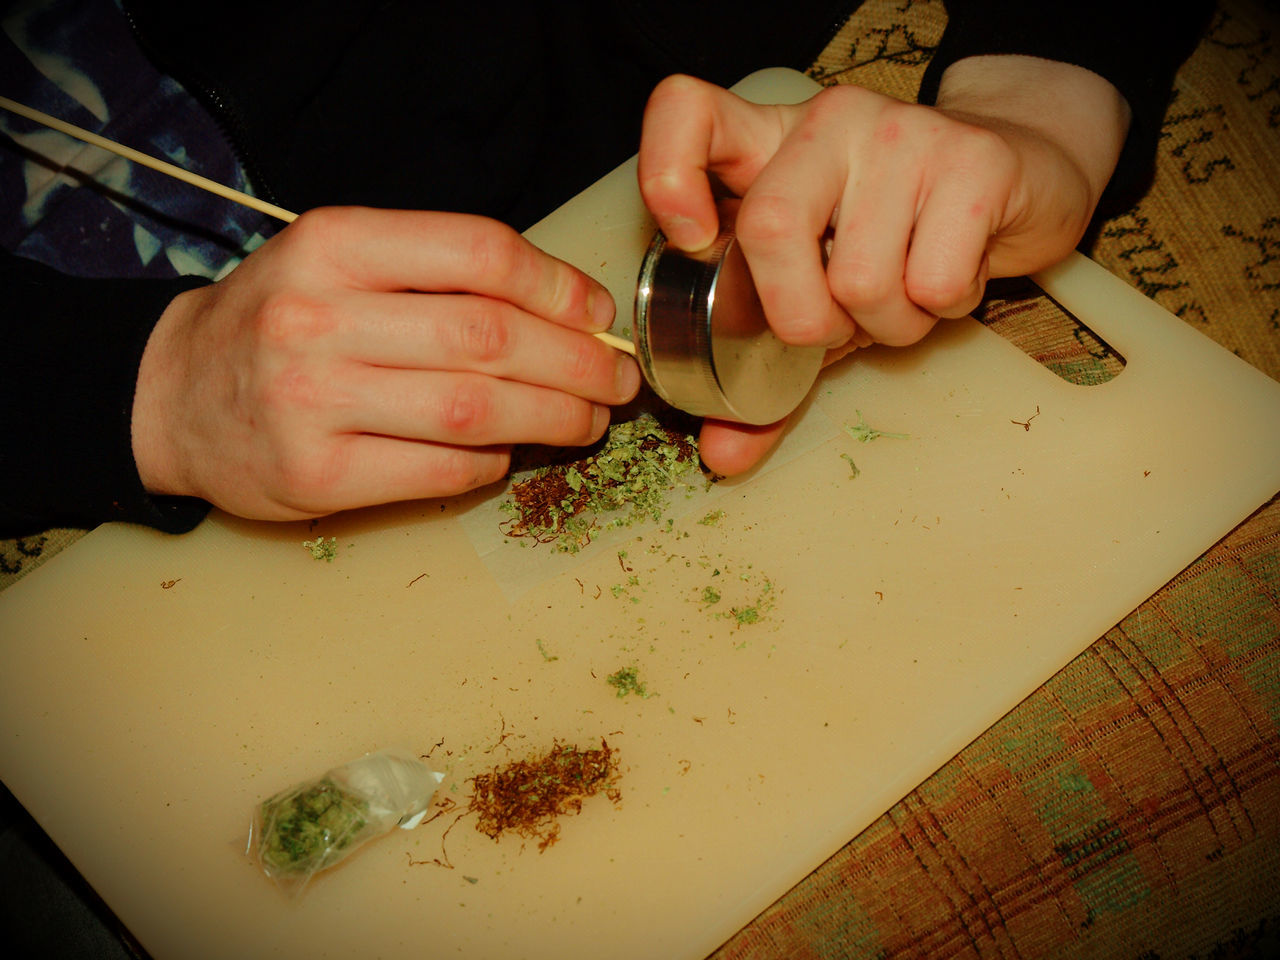 Zuiko Weed Stevesevilempire Steve Merrick Olympus Marijuana - Herbal Cannabis Marijuana Joint Smoking  Drugs Canabis